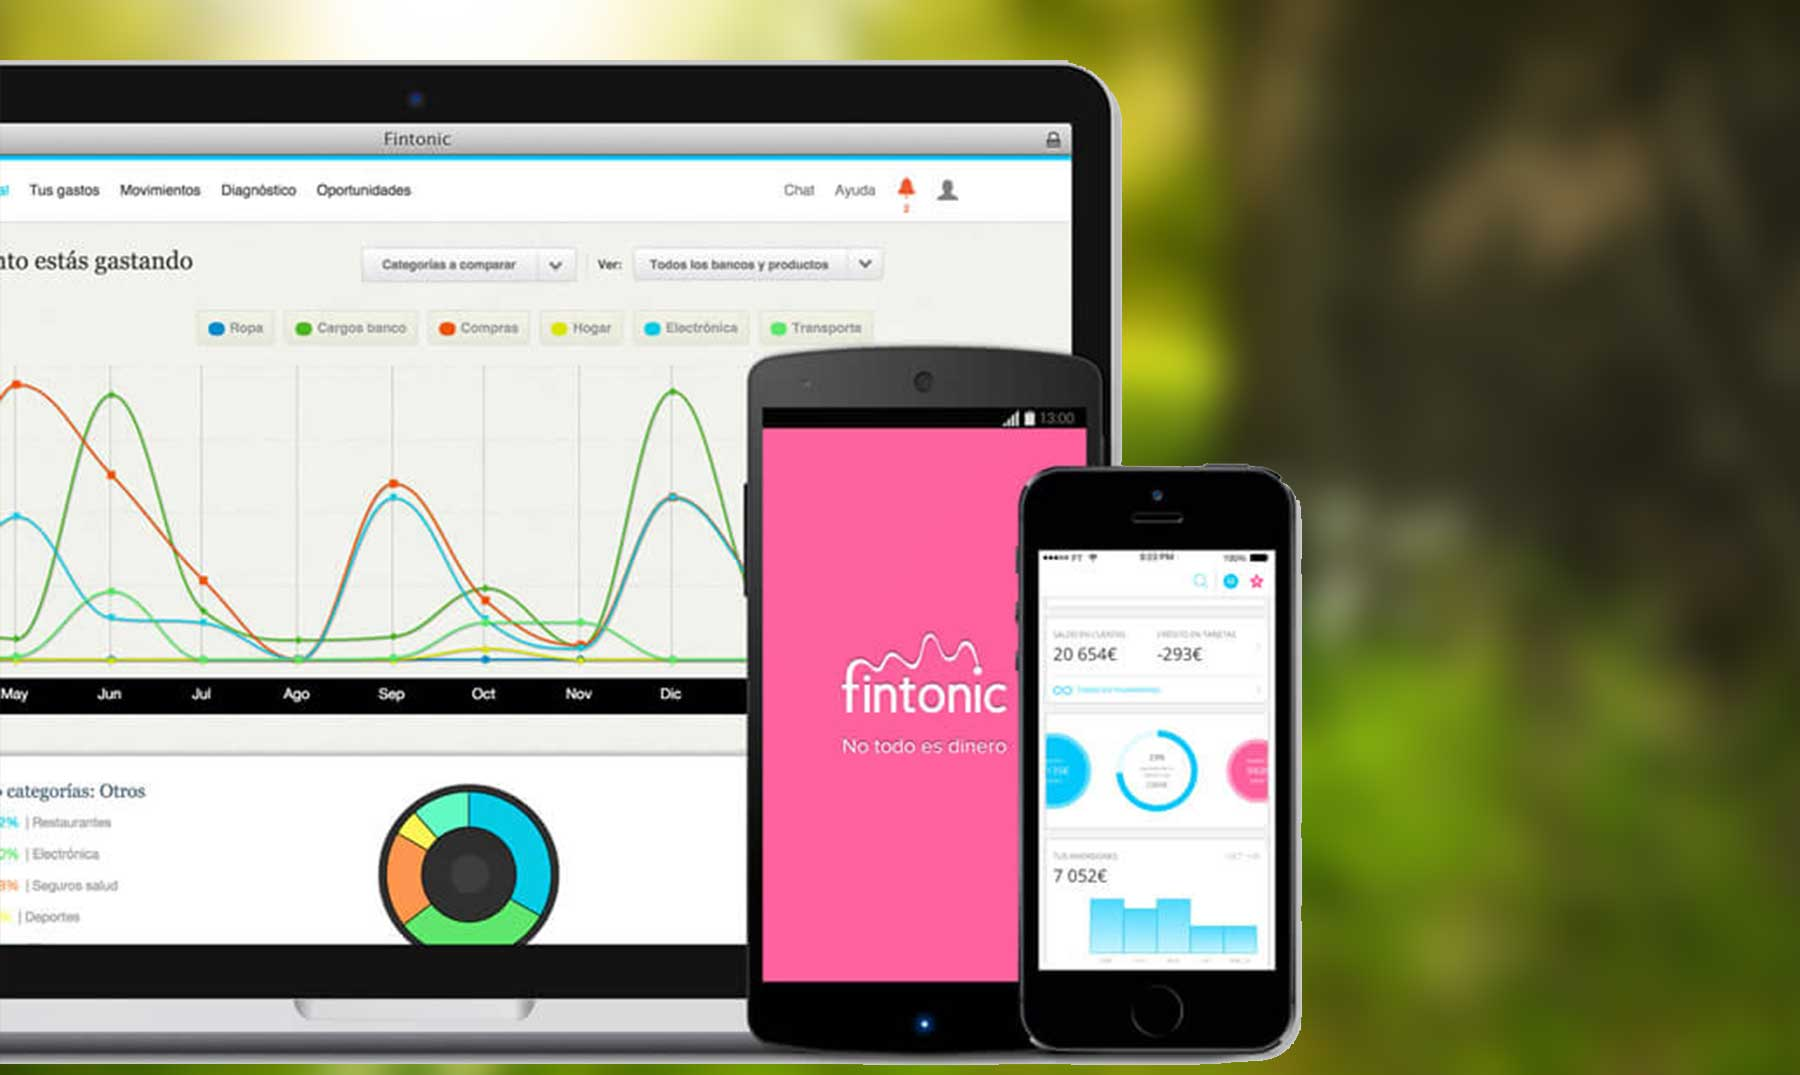 Fintonic levanta 25 millones de euros de financiación para invertir en LATAM/Fintonic financiación